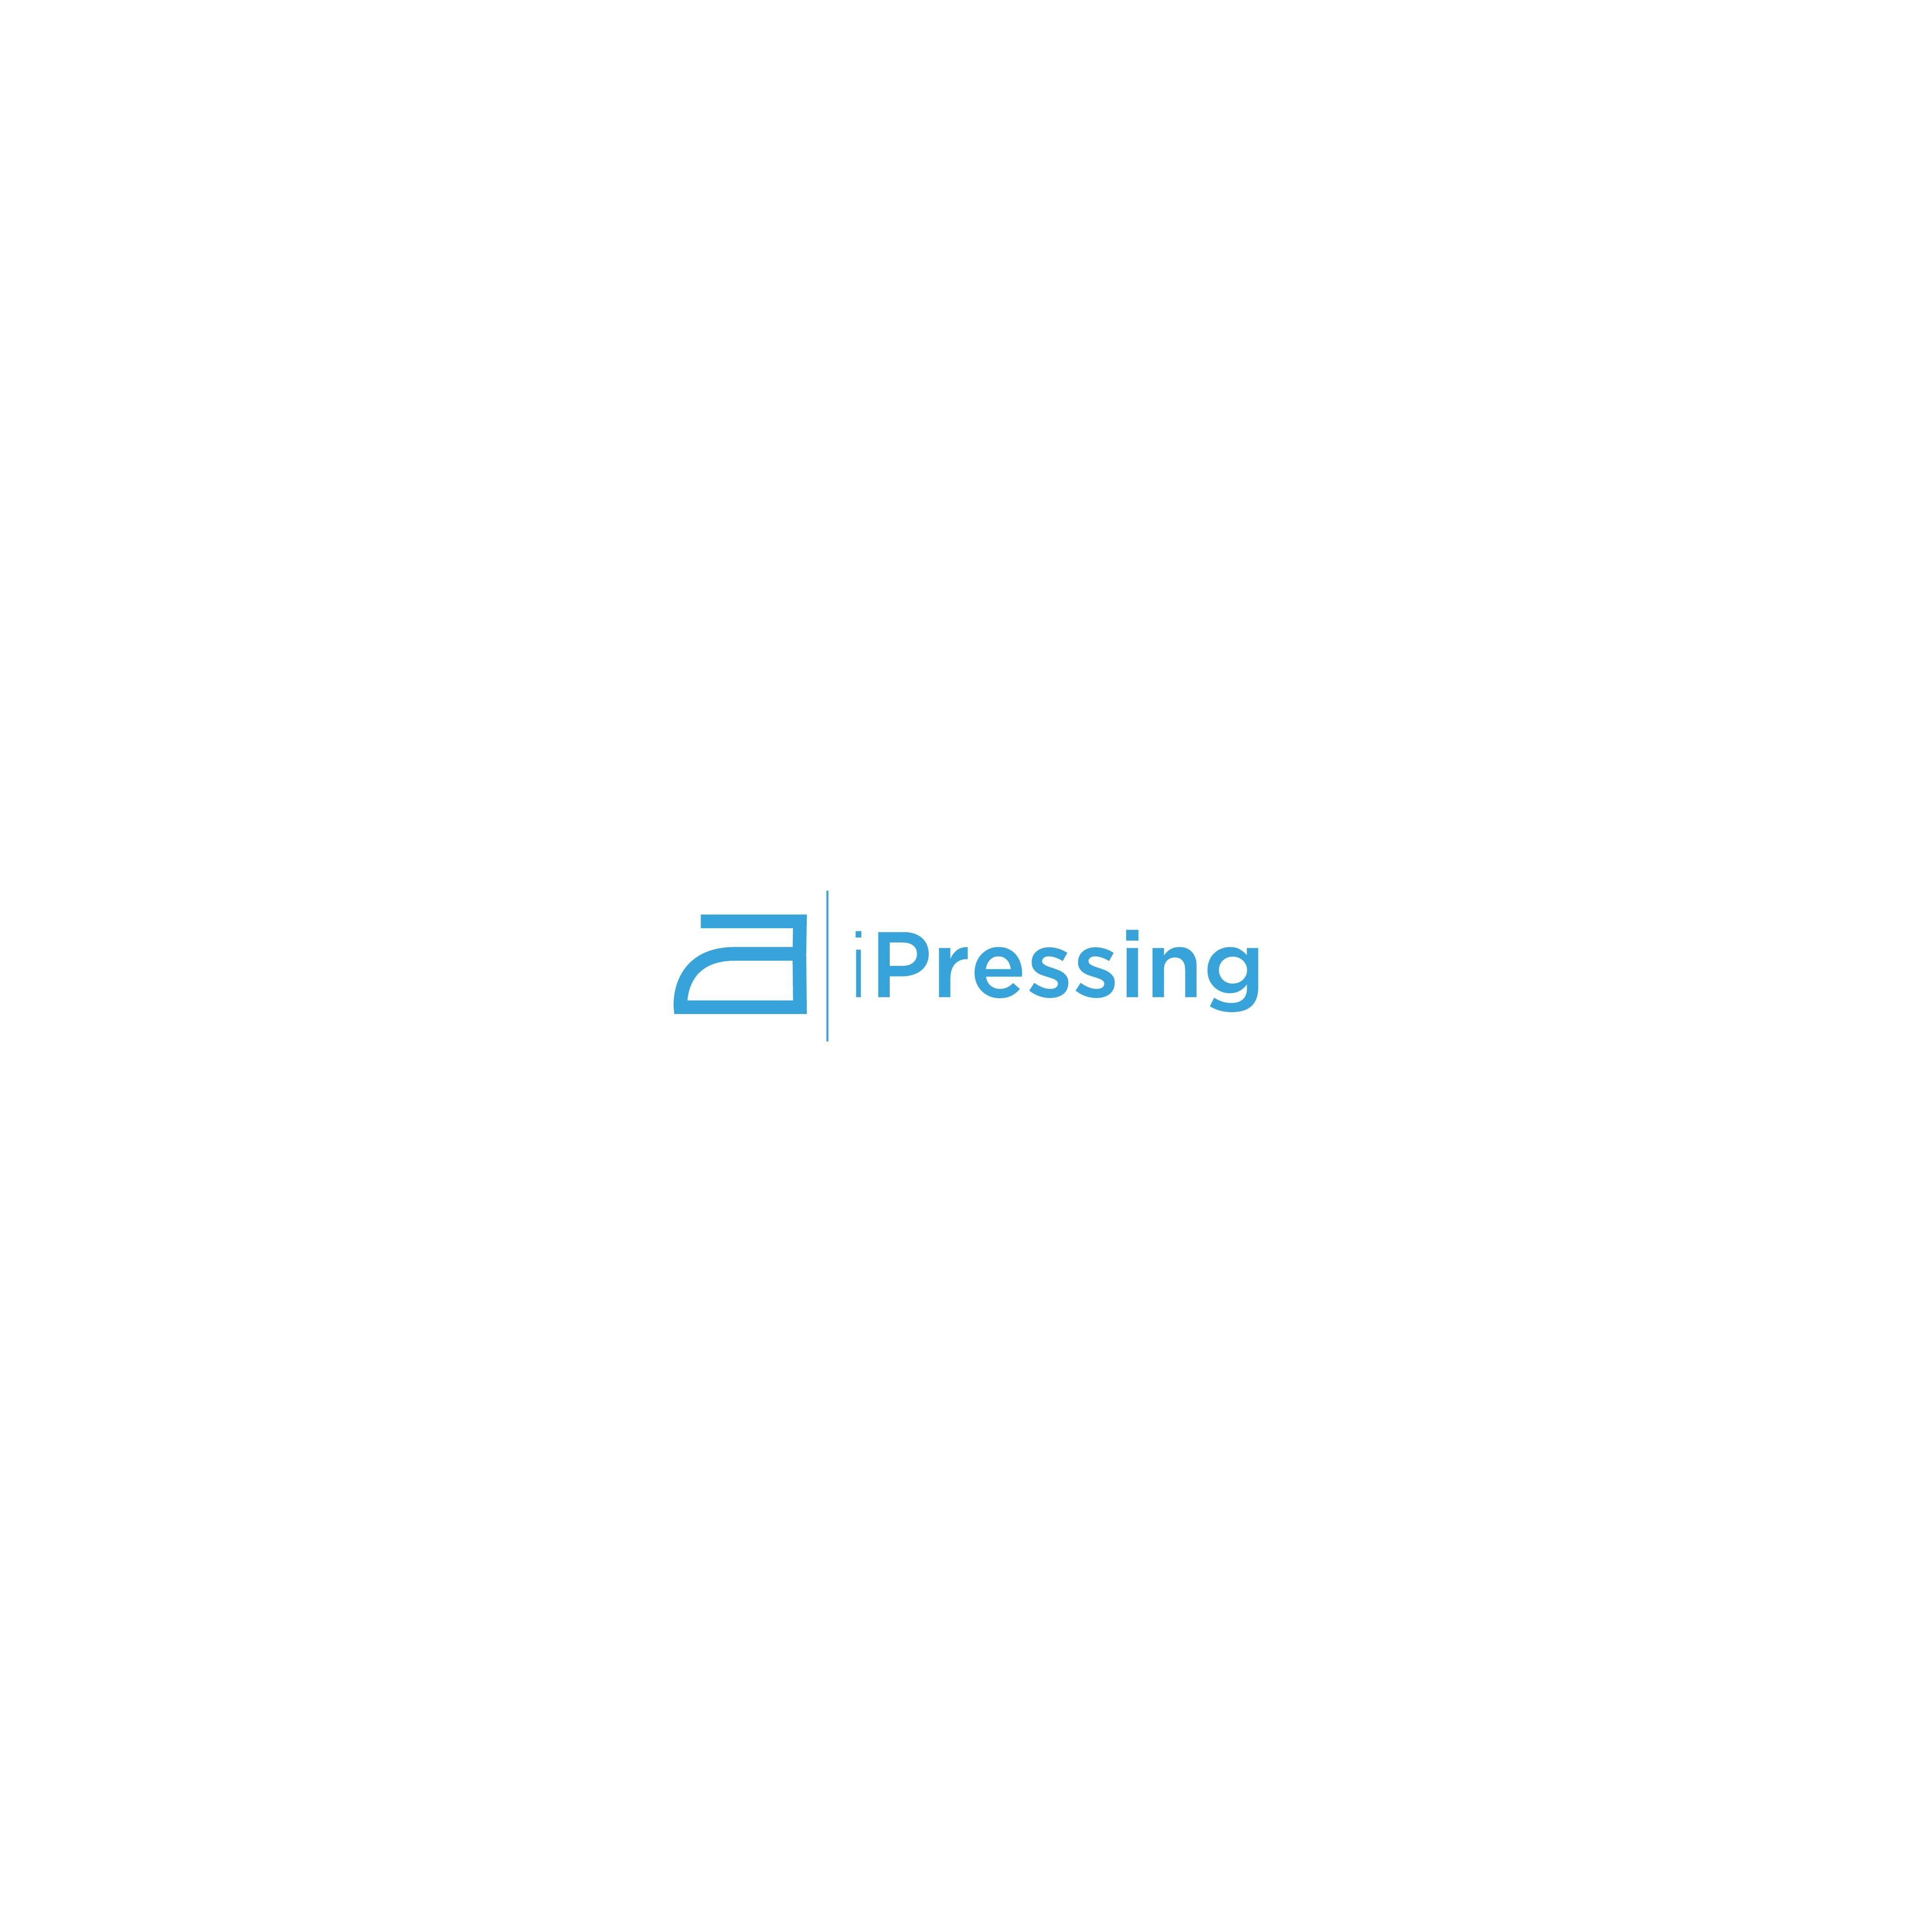 iPressing 2.0